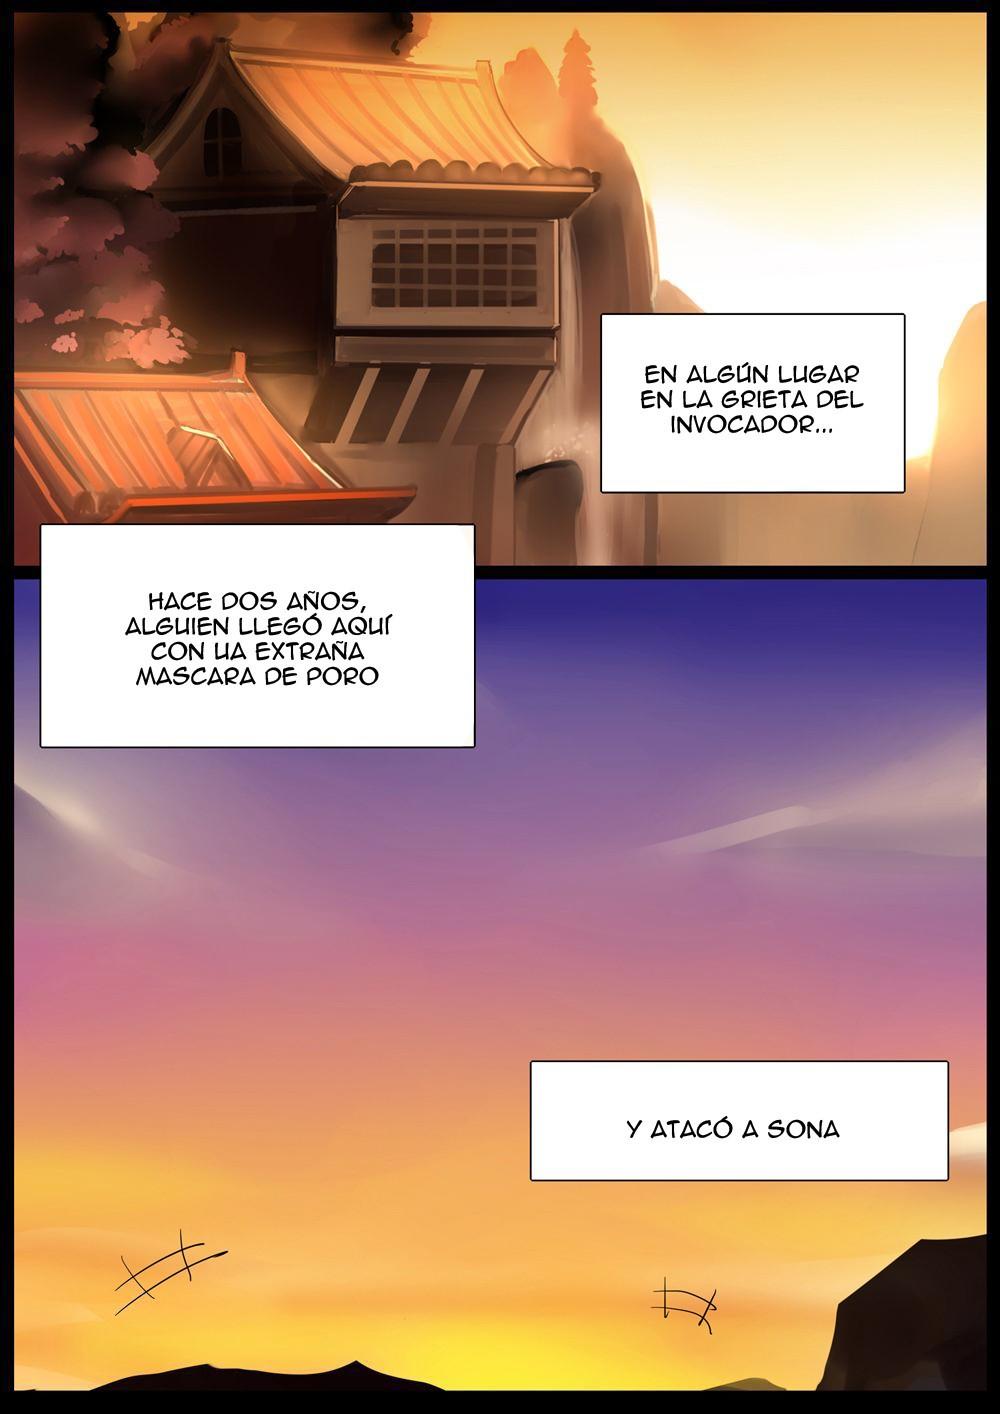 La-Casa-de-Sona-02.jpg